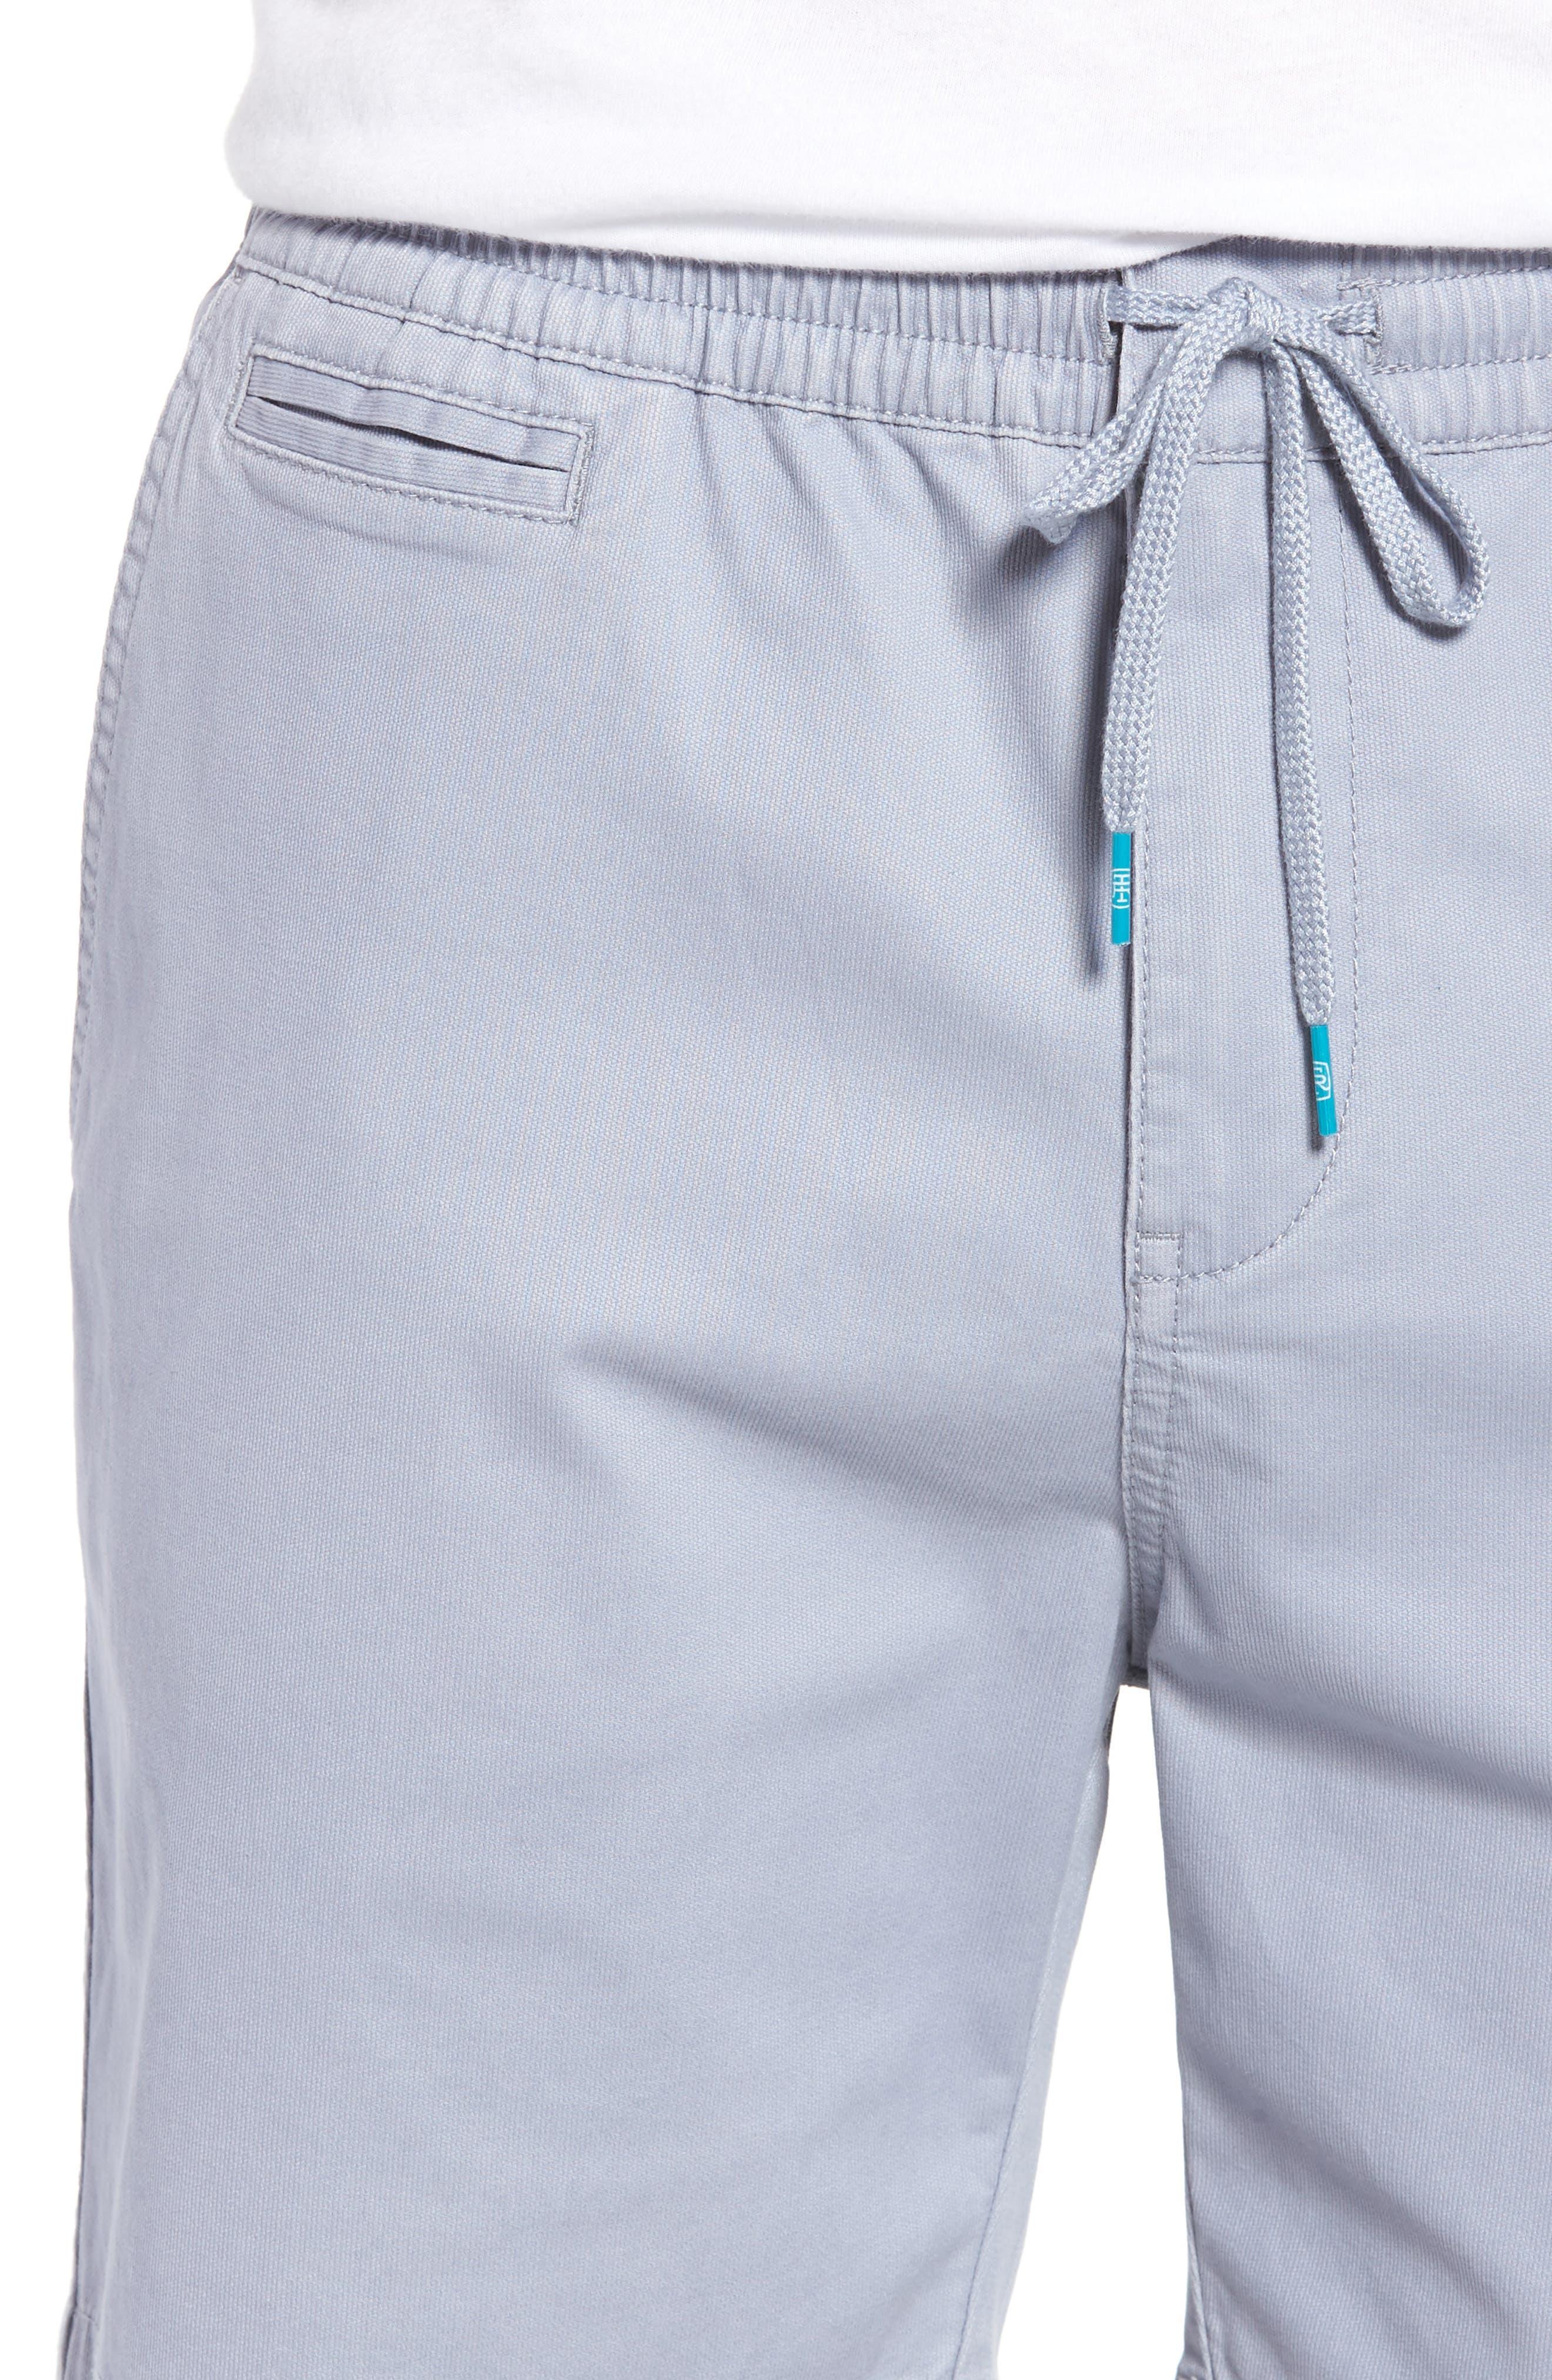 Drawstring Bedford Corduroy Shorts,                             Alternate thumbnail 12, color,